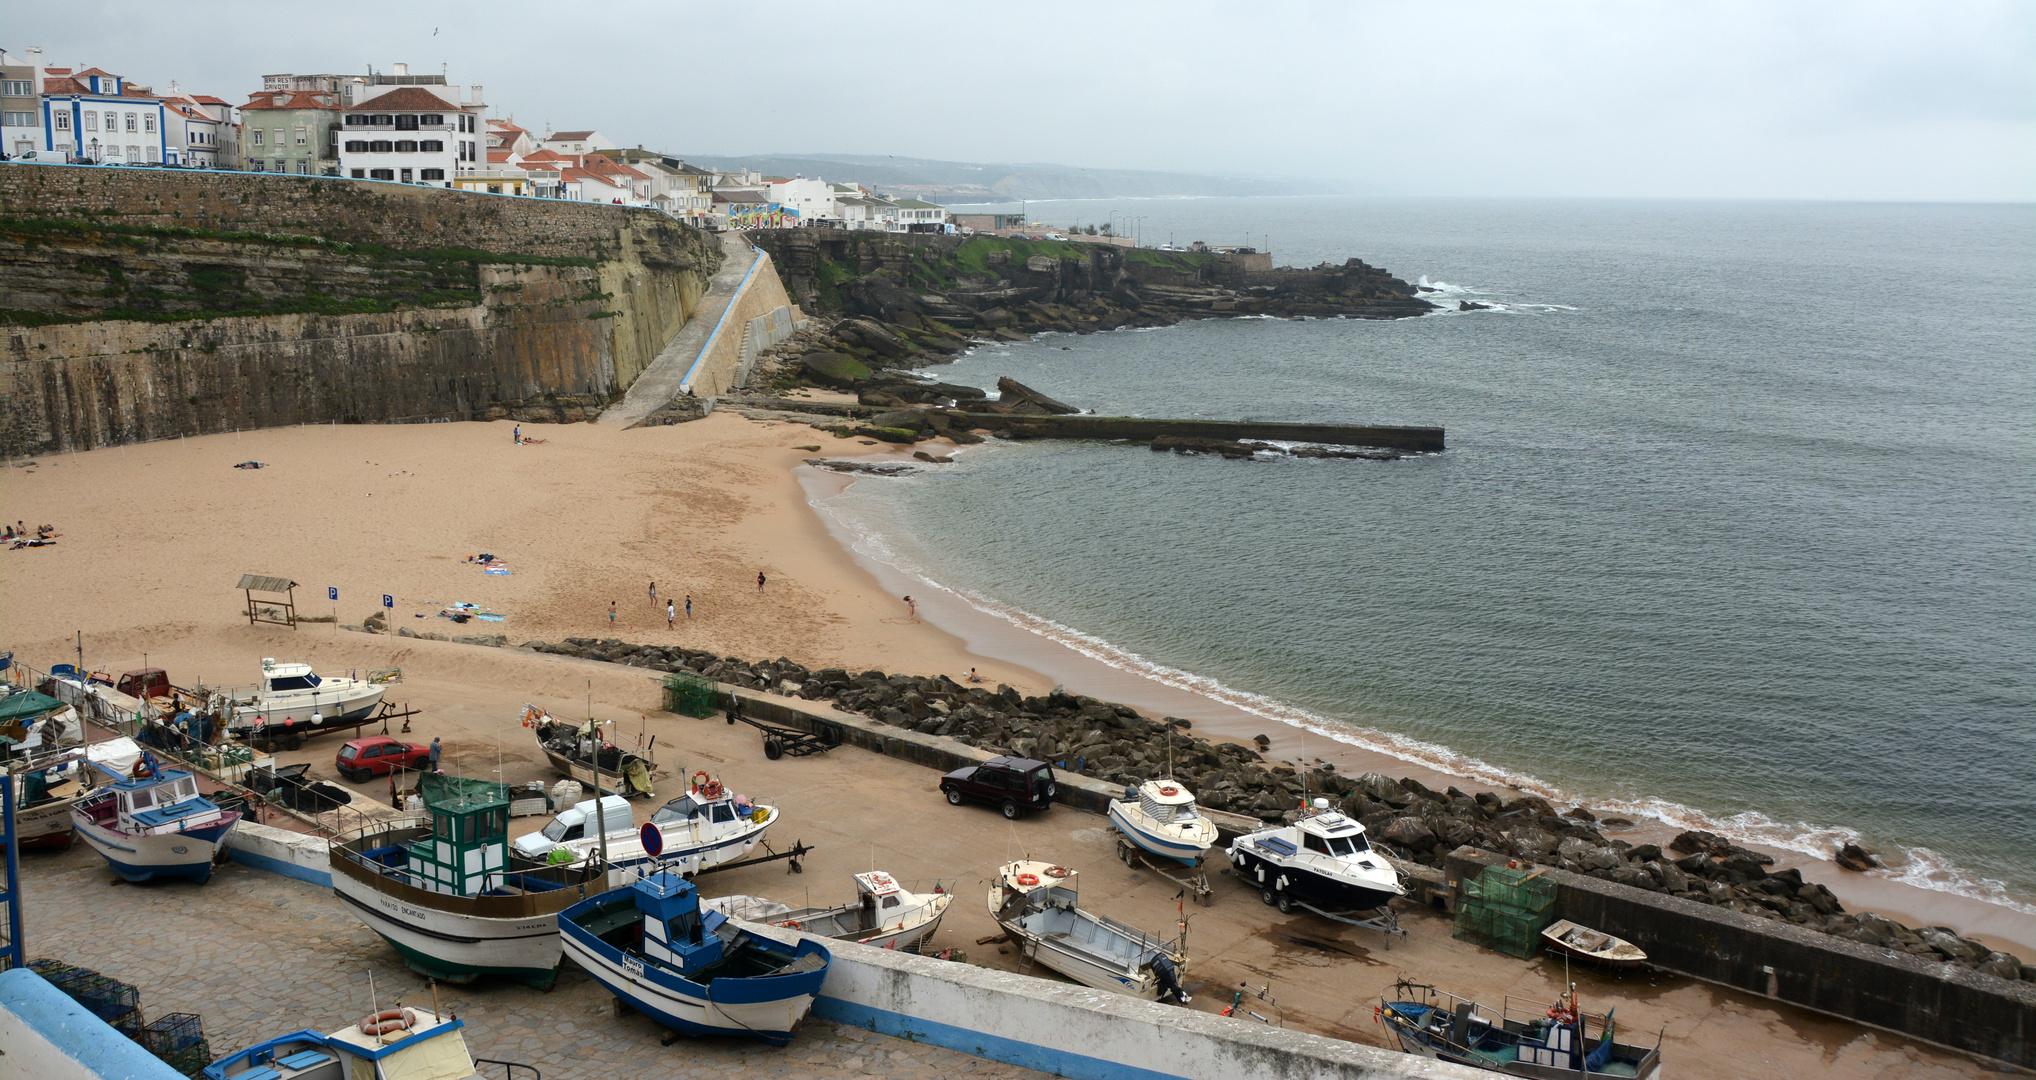 Strand von Lagos (Portugal)